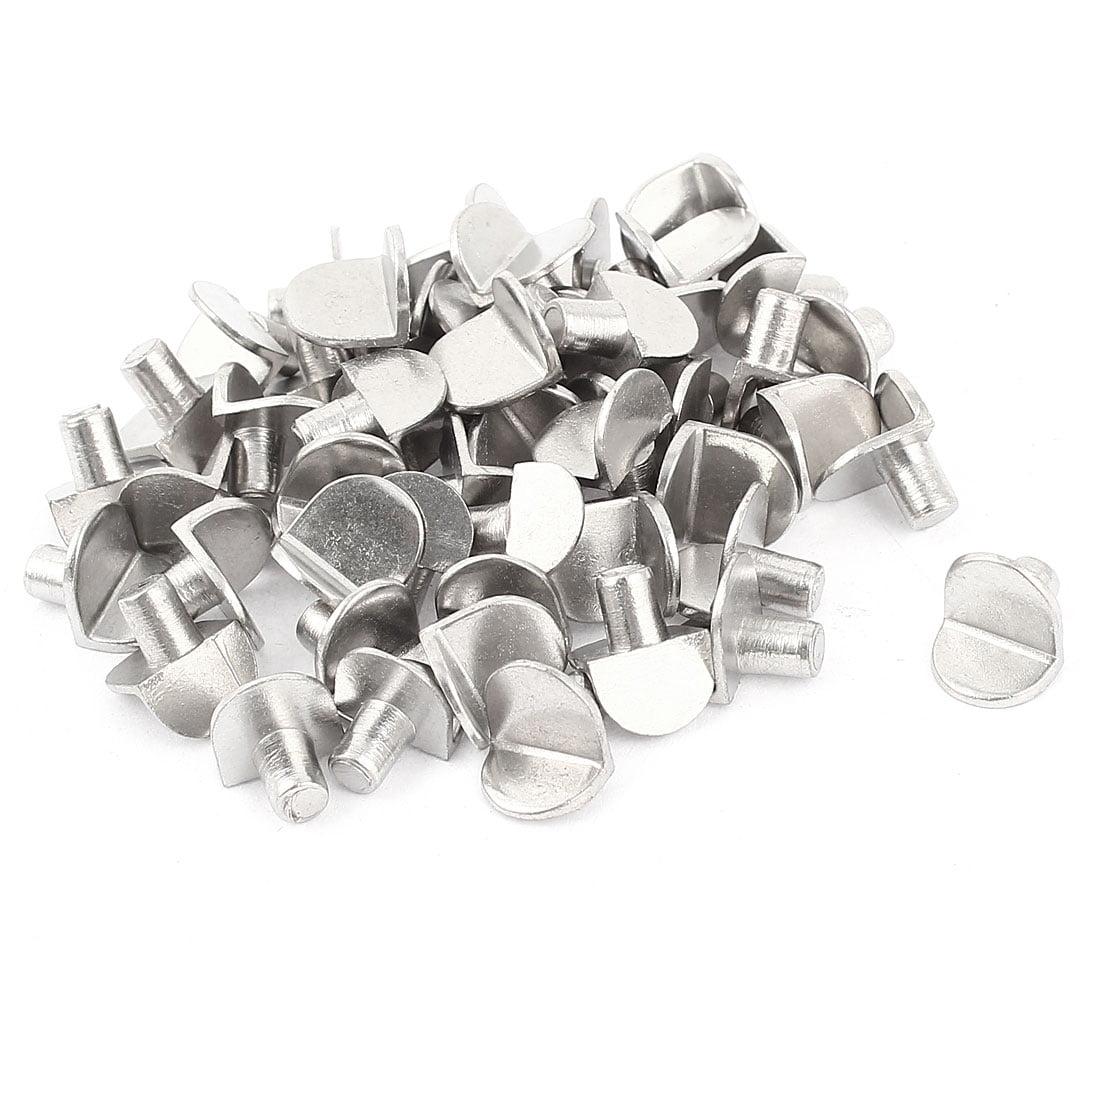 Unique Bargains L Shaped Glass Wooden Shelf Support Holder Pin Stud 50 Pcs